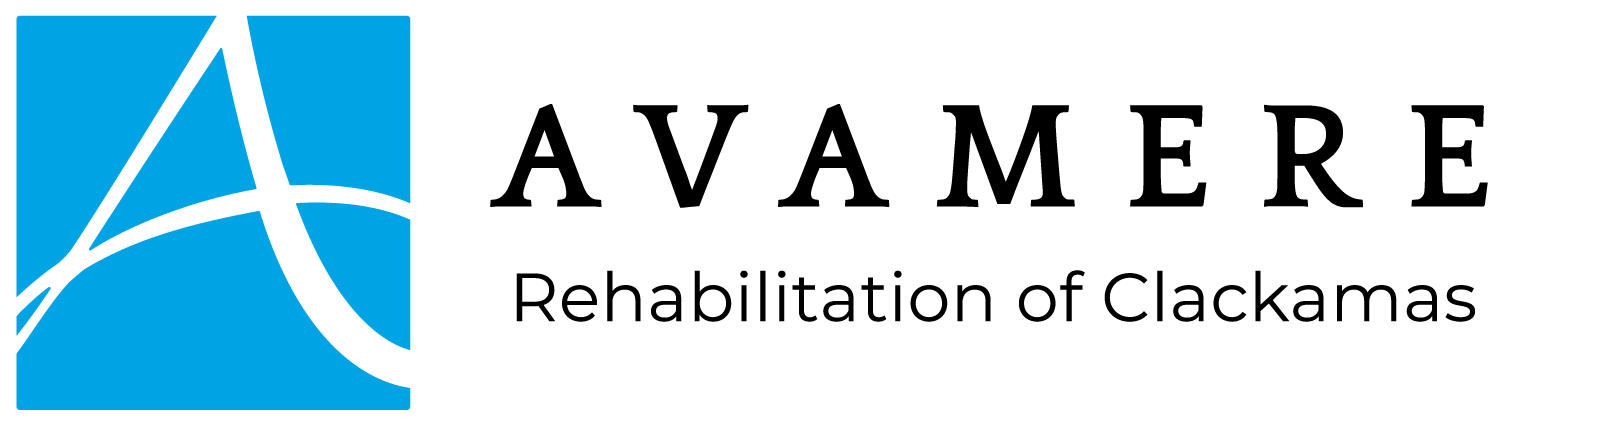 Avamere Rehabilitation of Clackamas logo